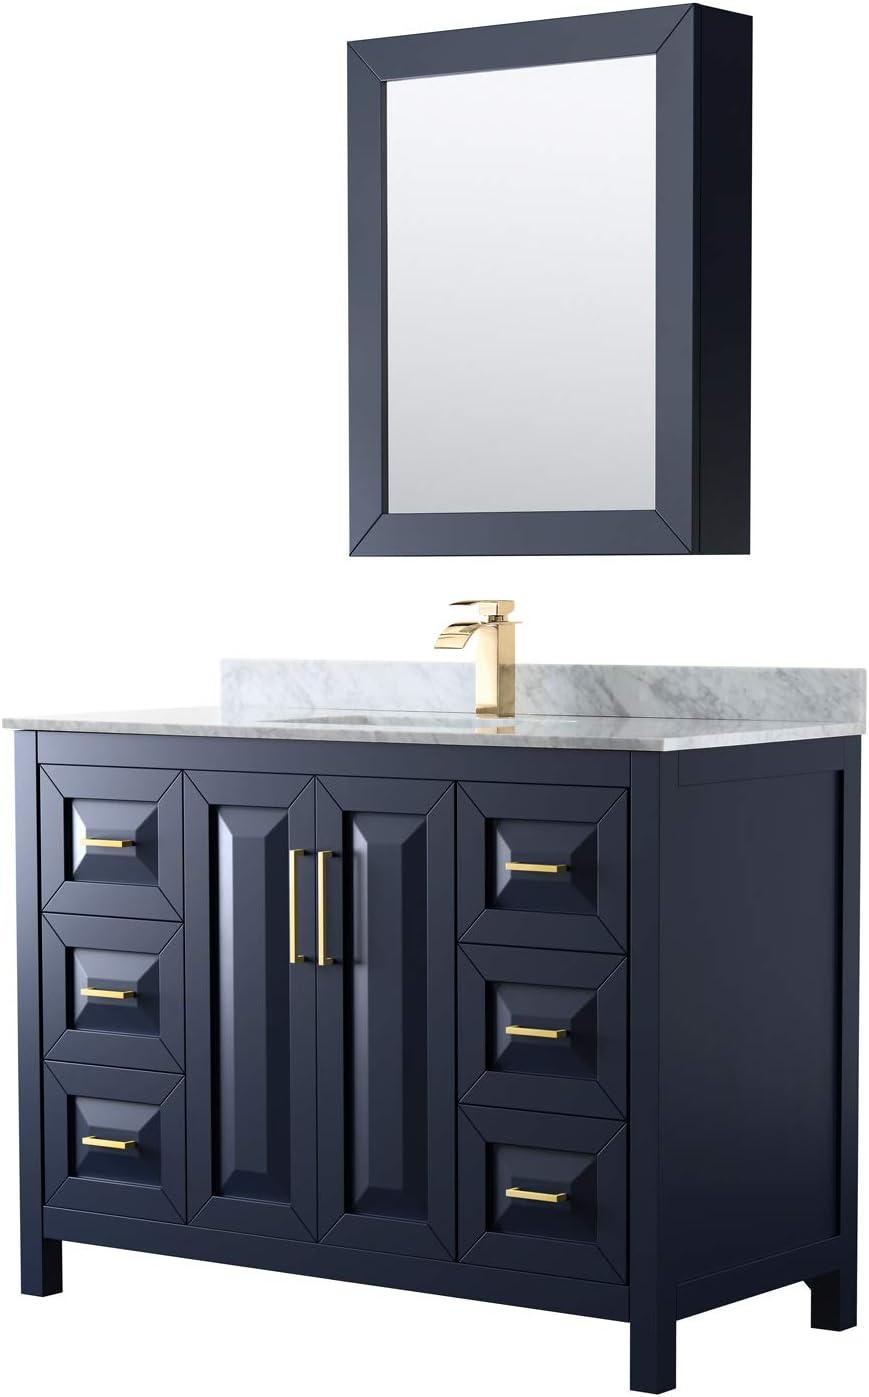 Daria 48 Inch Single High quality new Bathroom Vanity Max 68% OFF Blue Carrara in White Dark